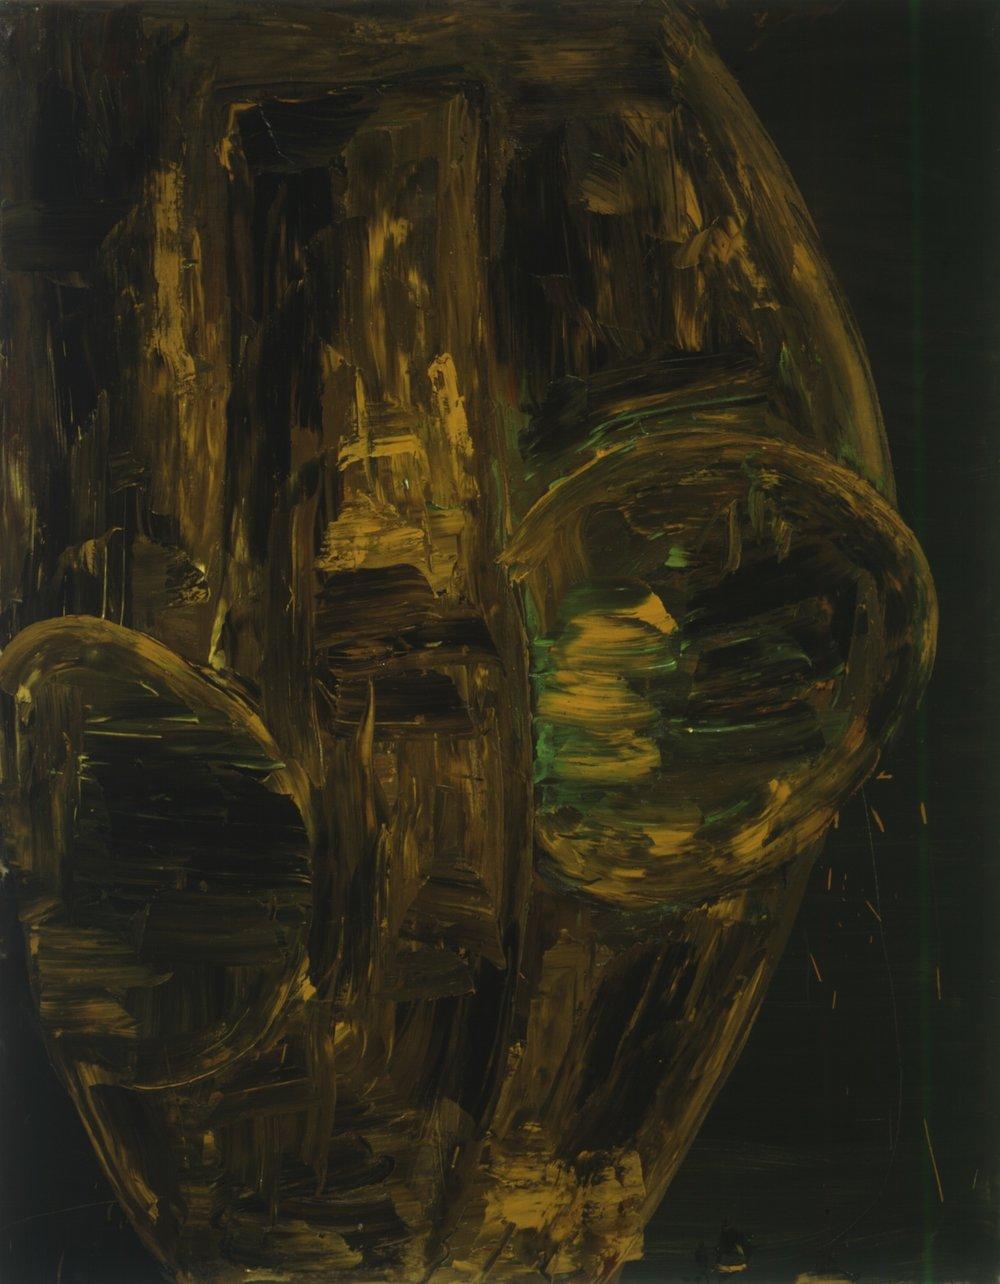 Grünocker III ,1992, Oil on canvas, 71h x 55w in (180h x 140w cm)